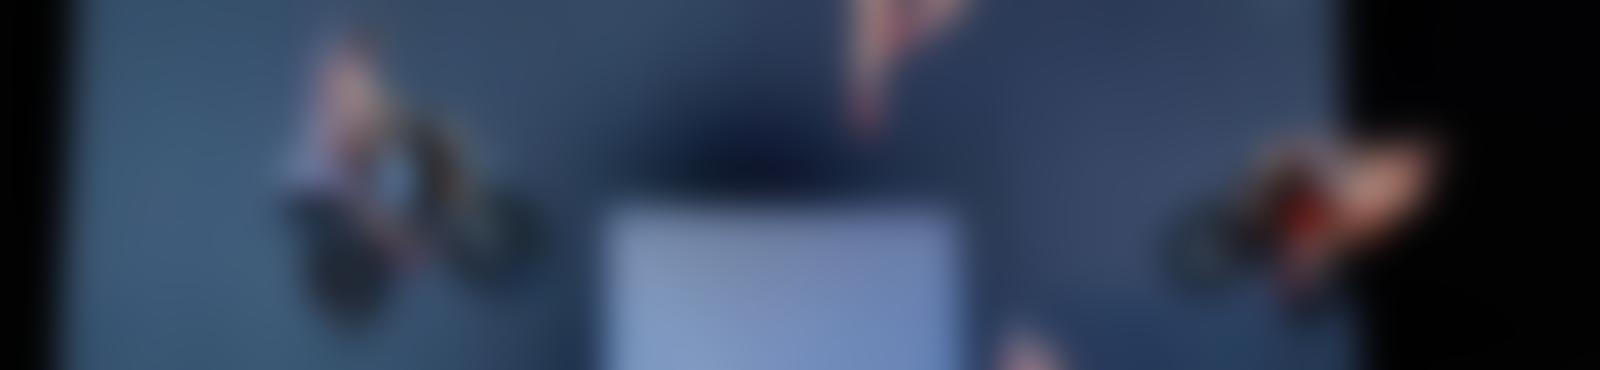 Blurred f96c79f4 ea56 44e8 9231 31480e9d2a64